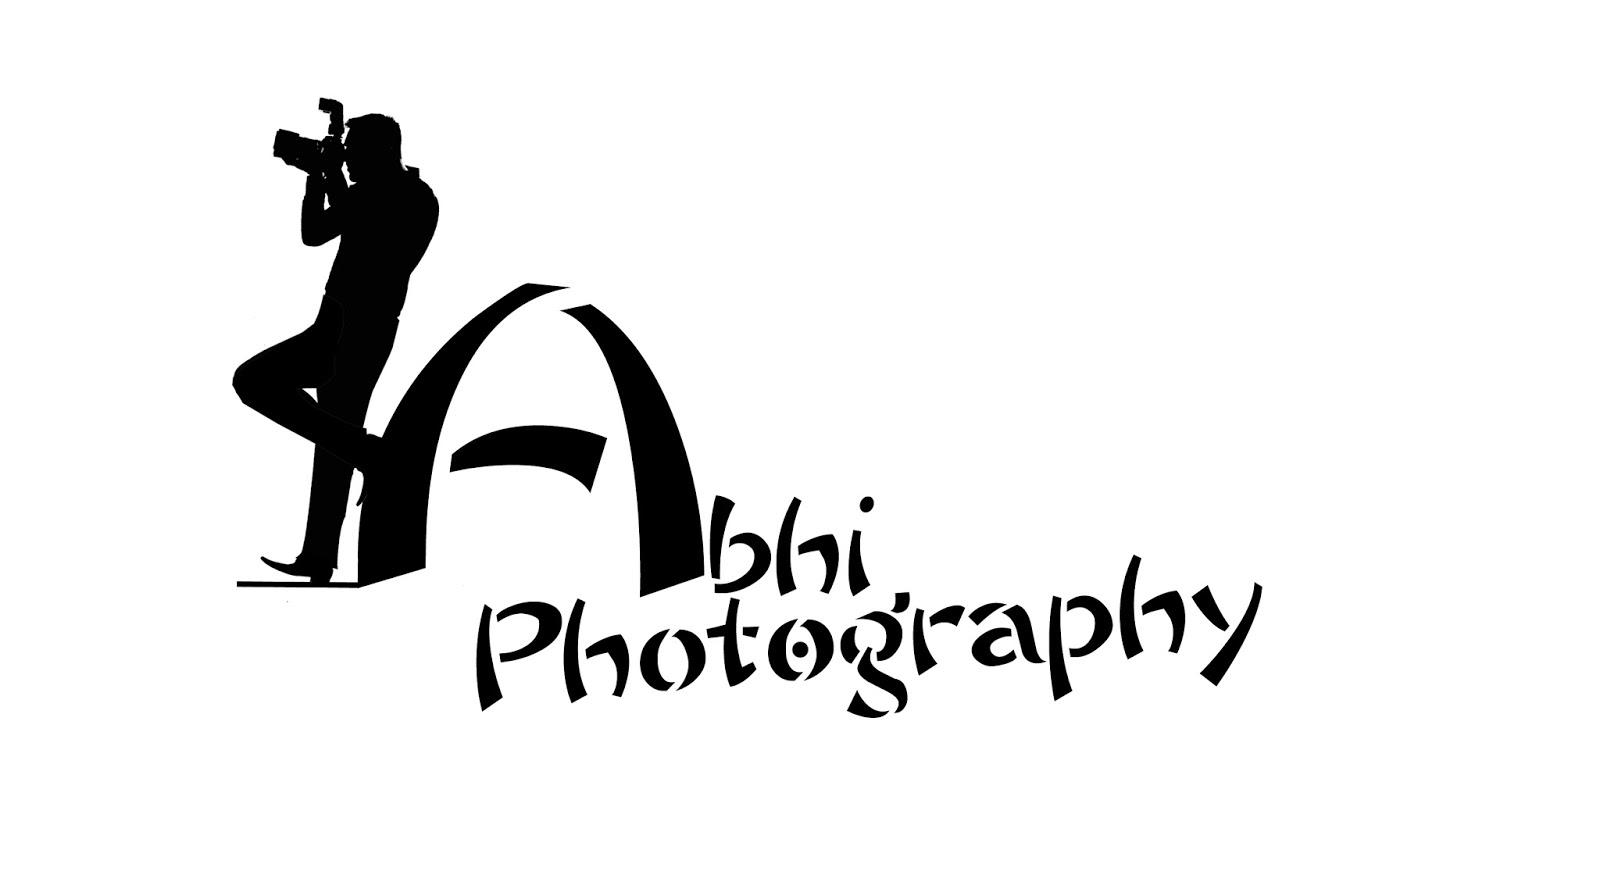 Abhi photography: my logo